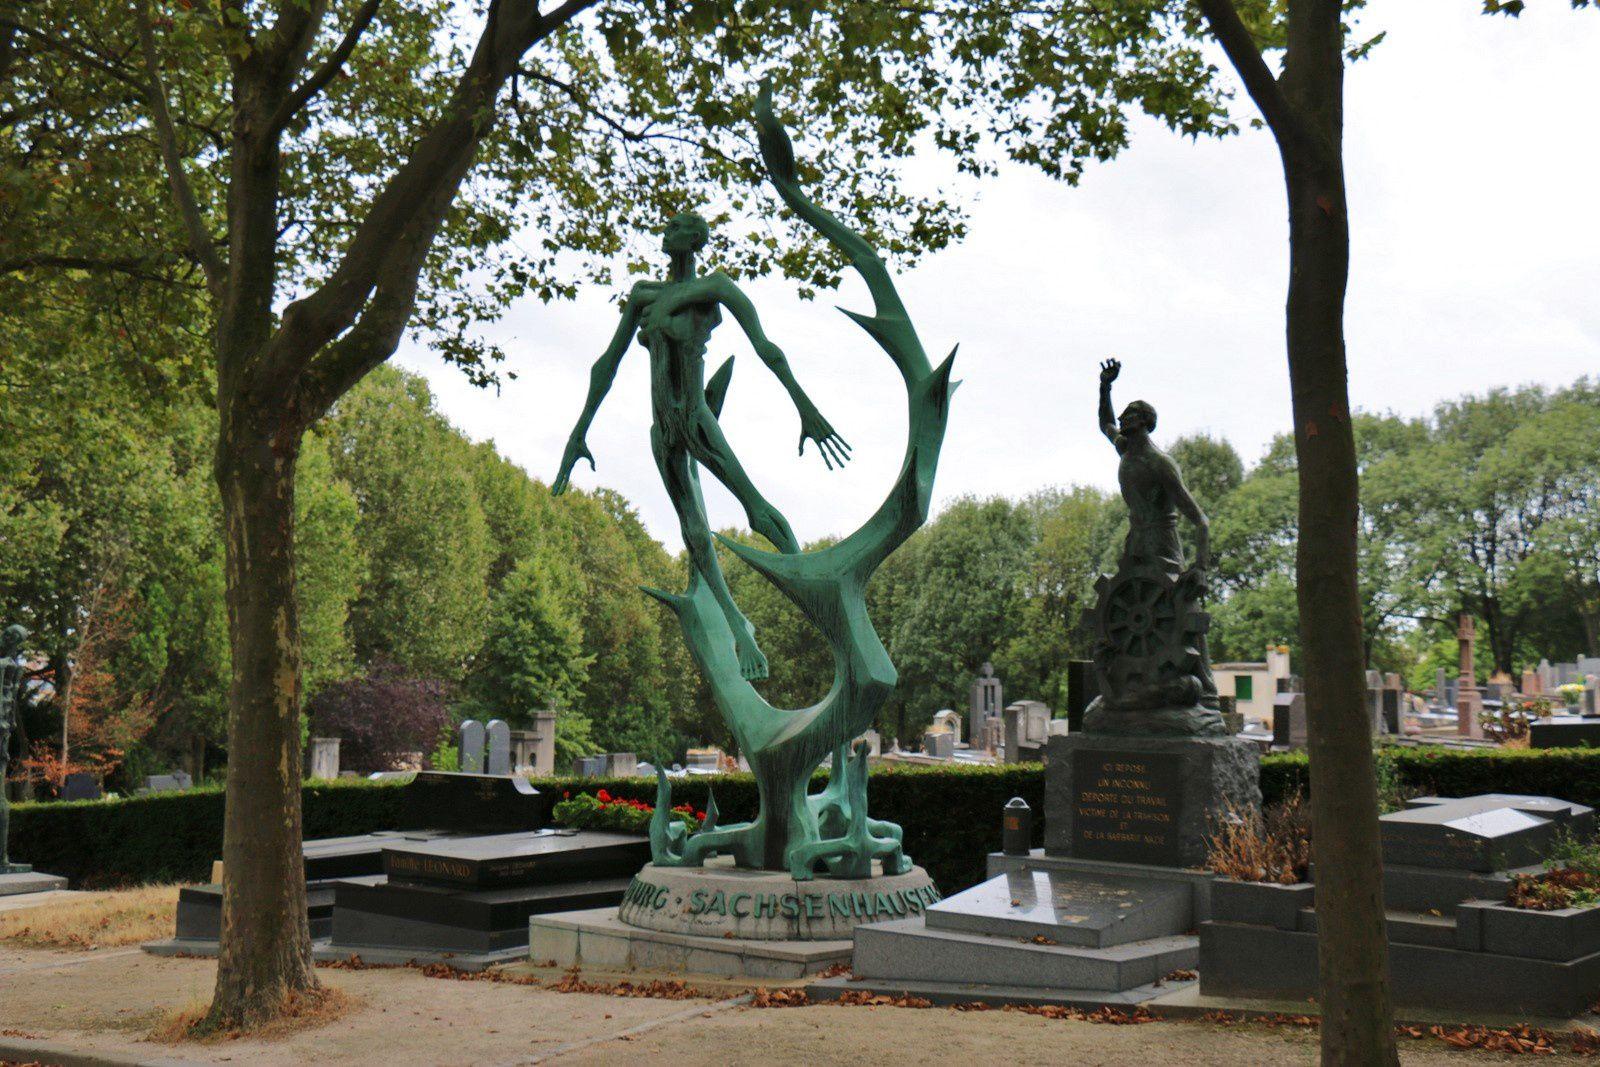 Monument d'Oranienburg-Sachsenhausen